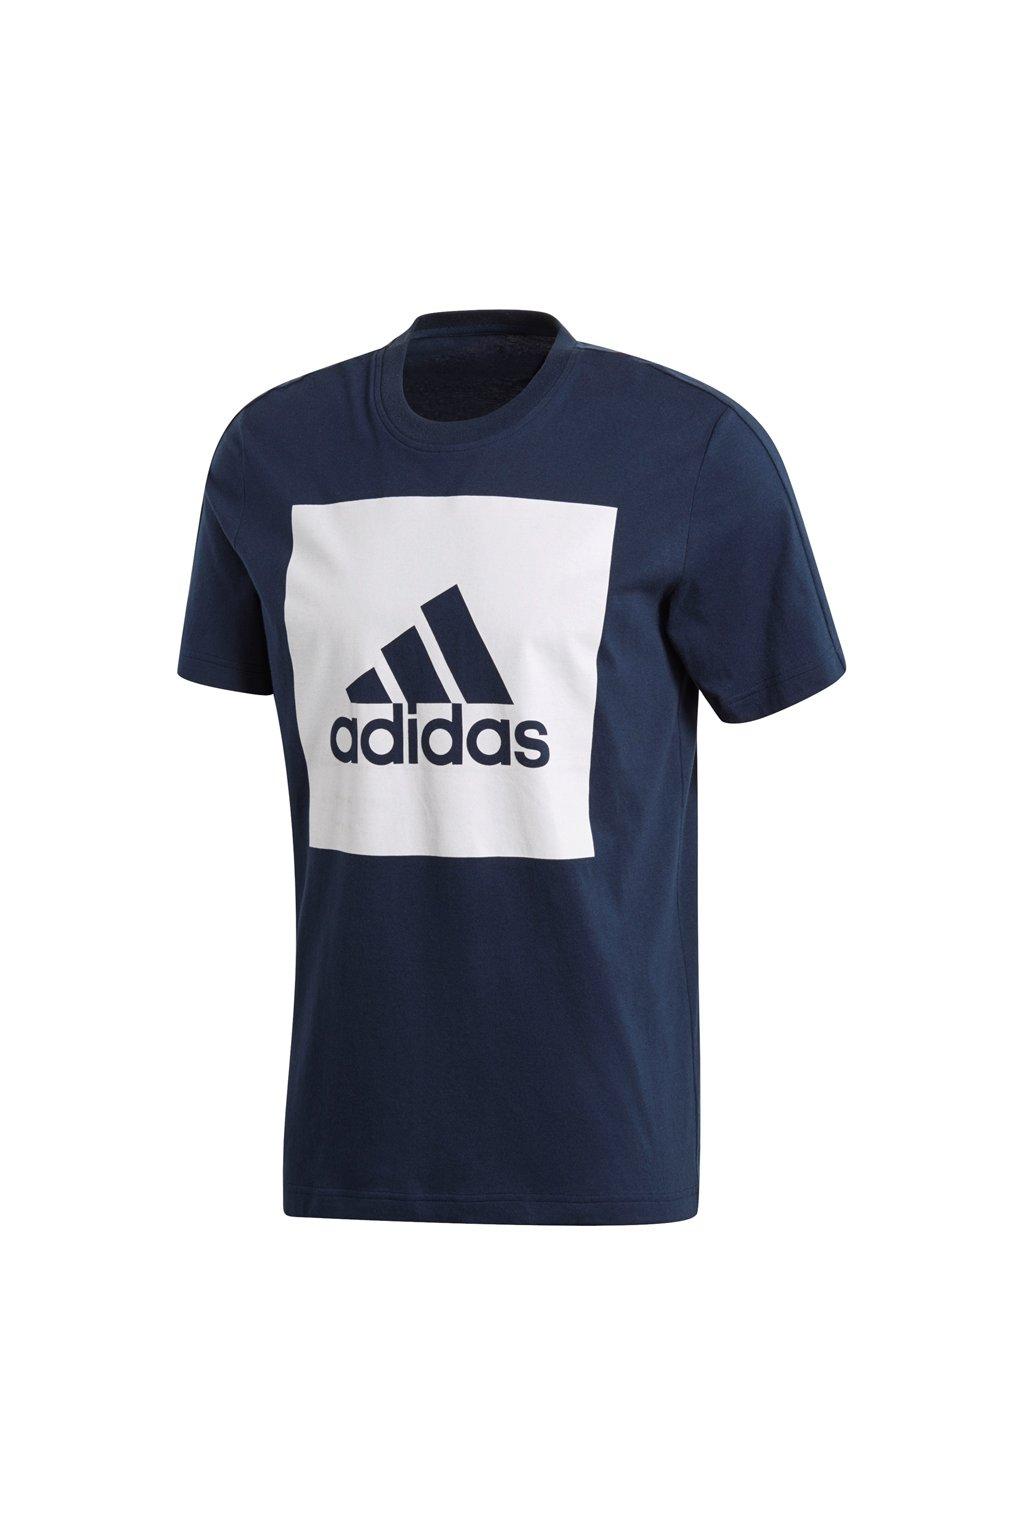 Pánske tričko Adidas ESSENTIALS BIG LOGO / tmavo modré S98726